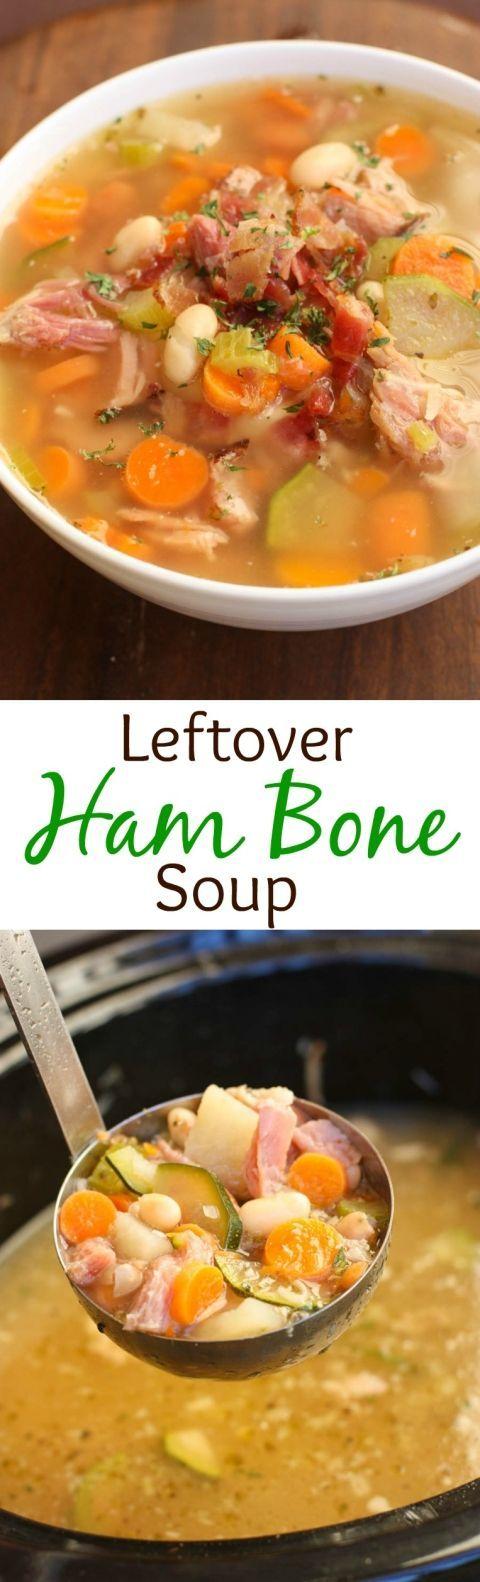 Slow Cooker Leftover Ham Bone Soup| Tastes Better From Scratch